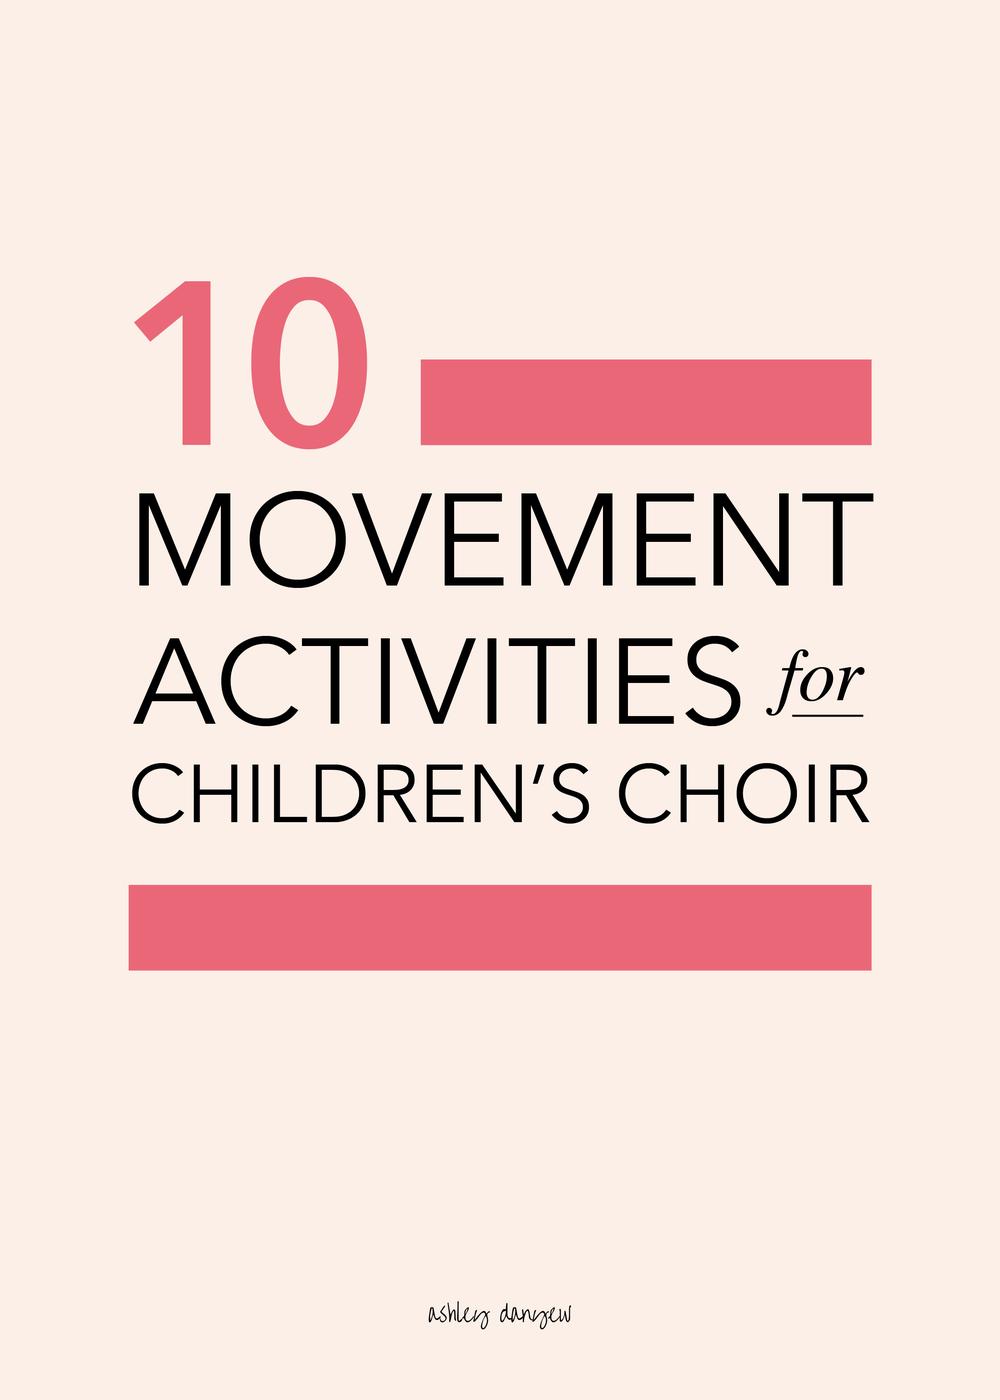 Copy of 10 Movement Activities for Children's Choir